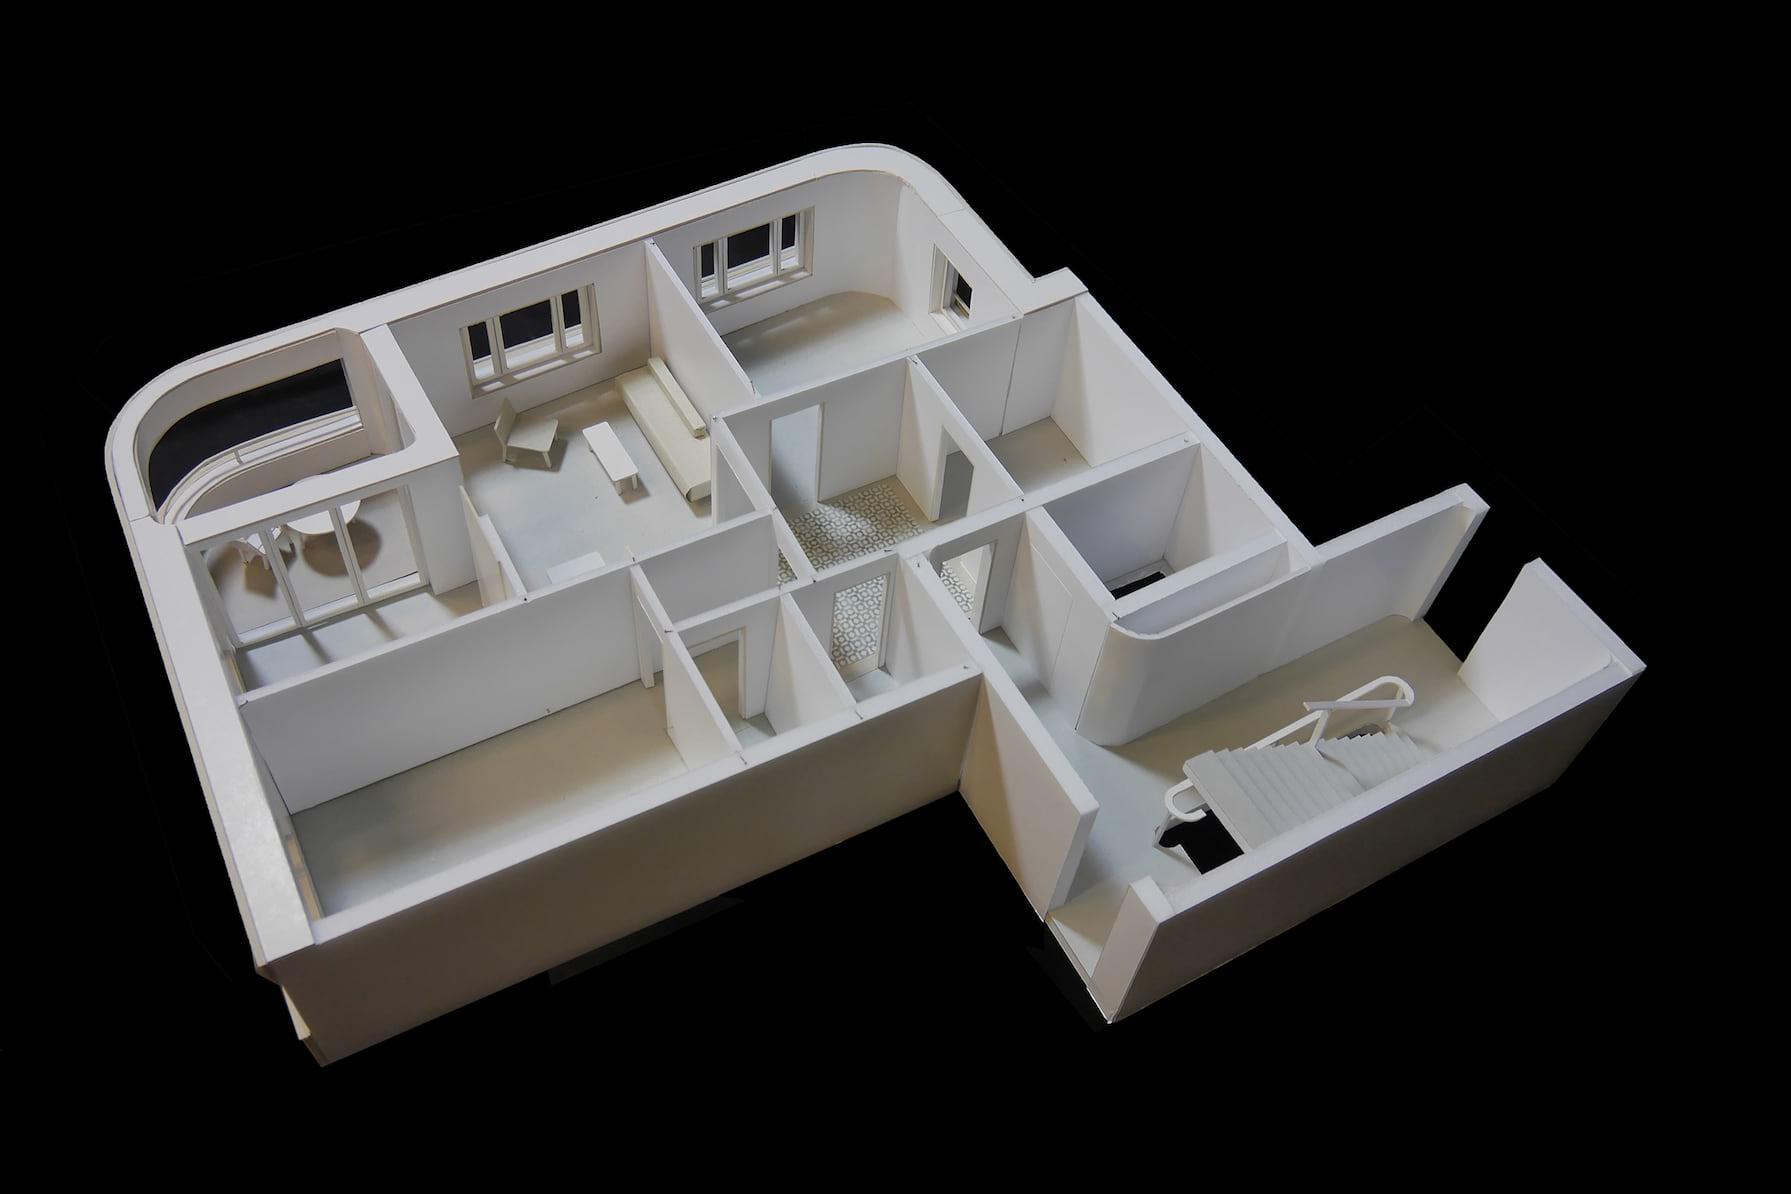 modell1-2zu3.jpg